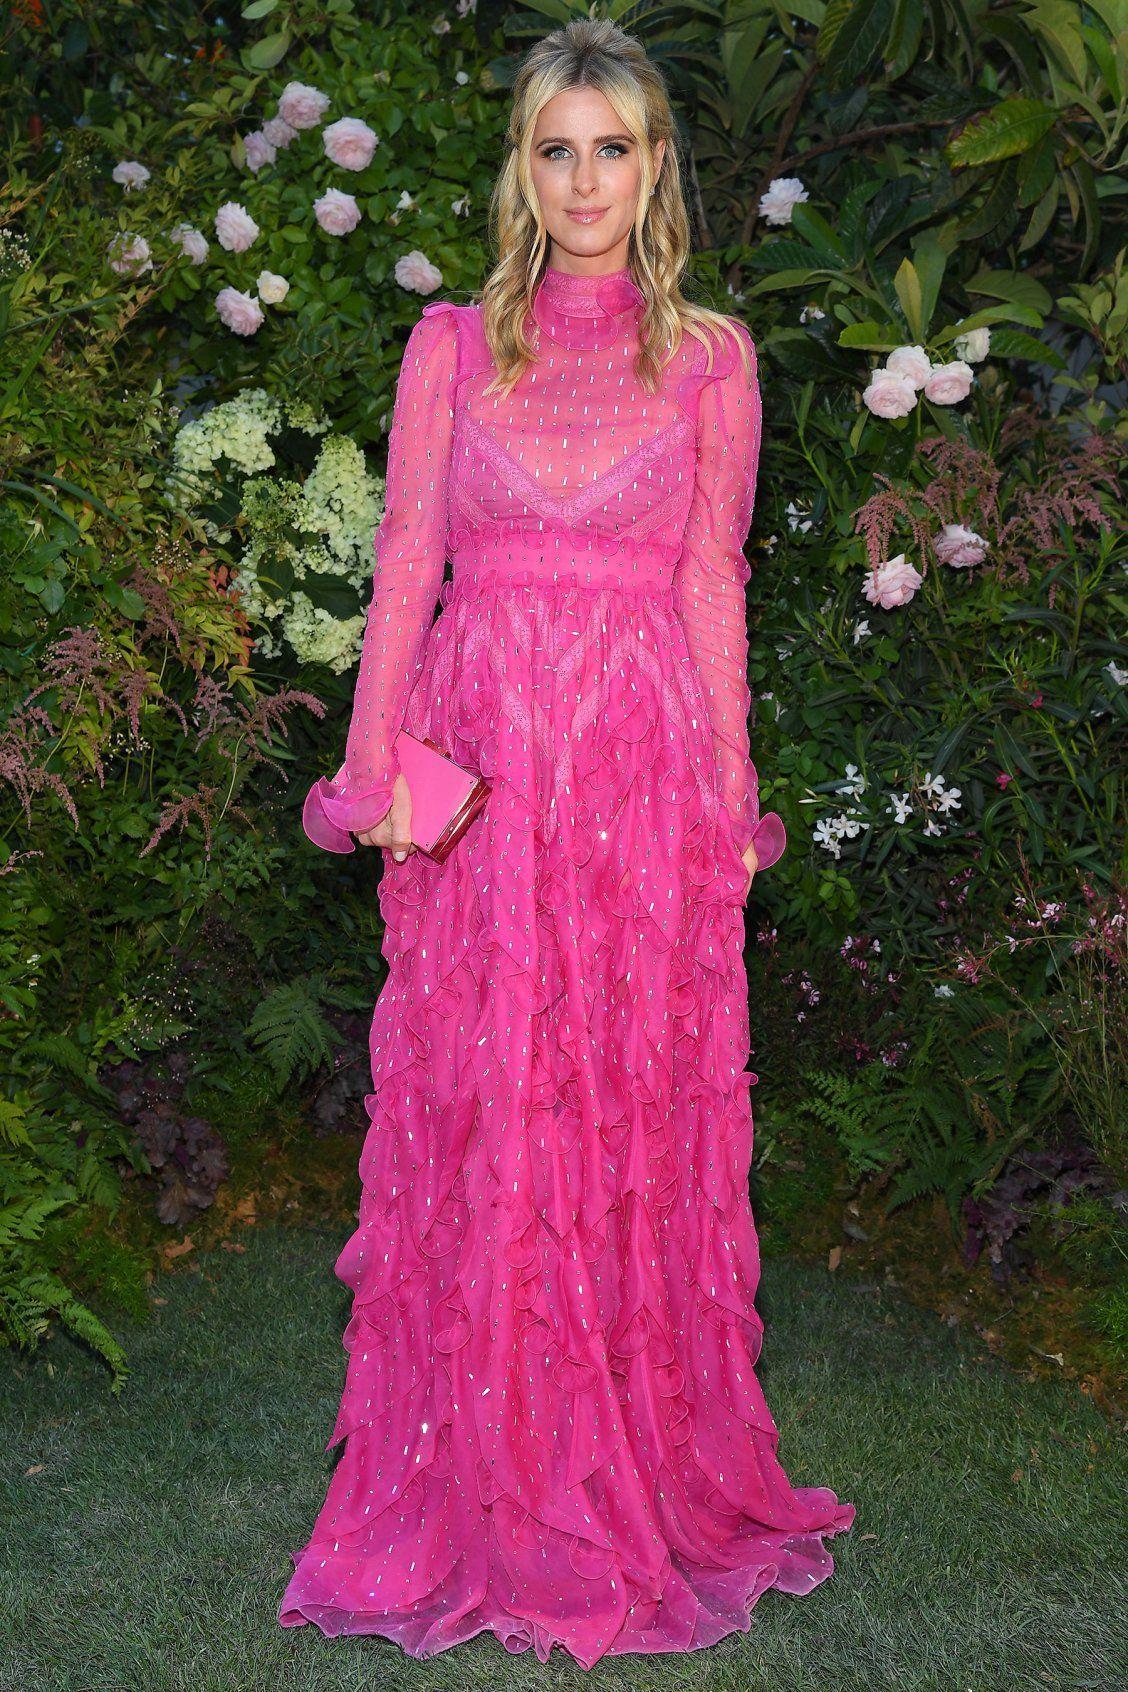 Bikini Pics of Ashley Kirk. 2018-2019 celebrityes photos leaks! - 2019 year